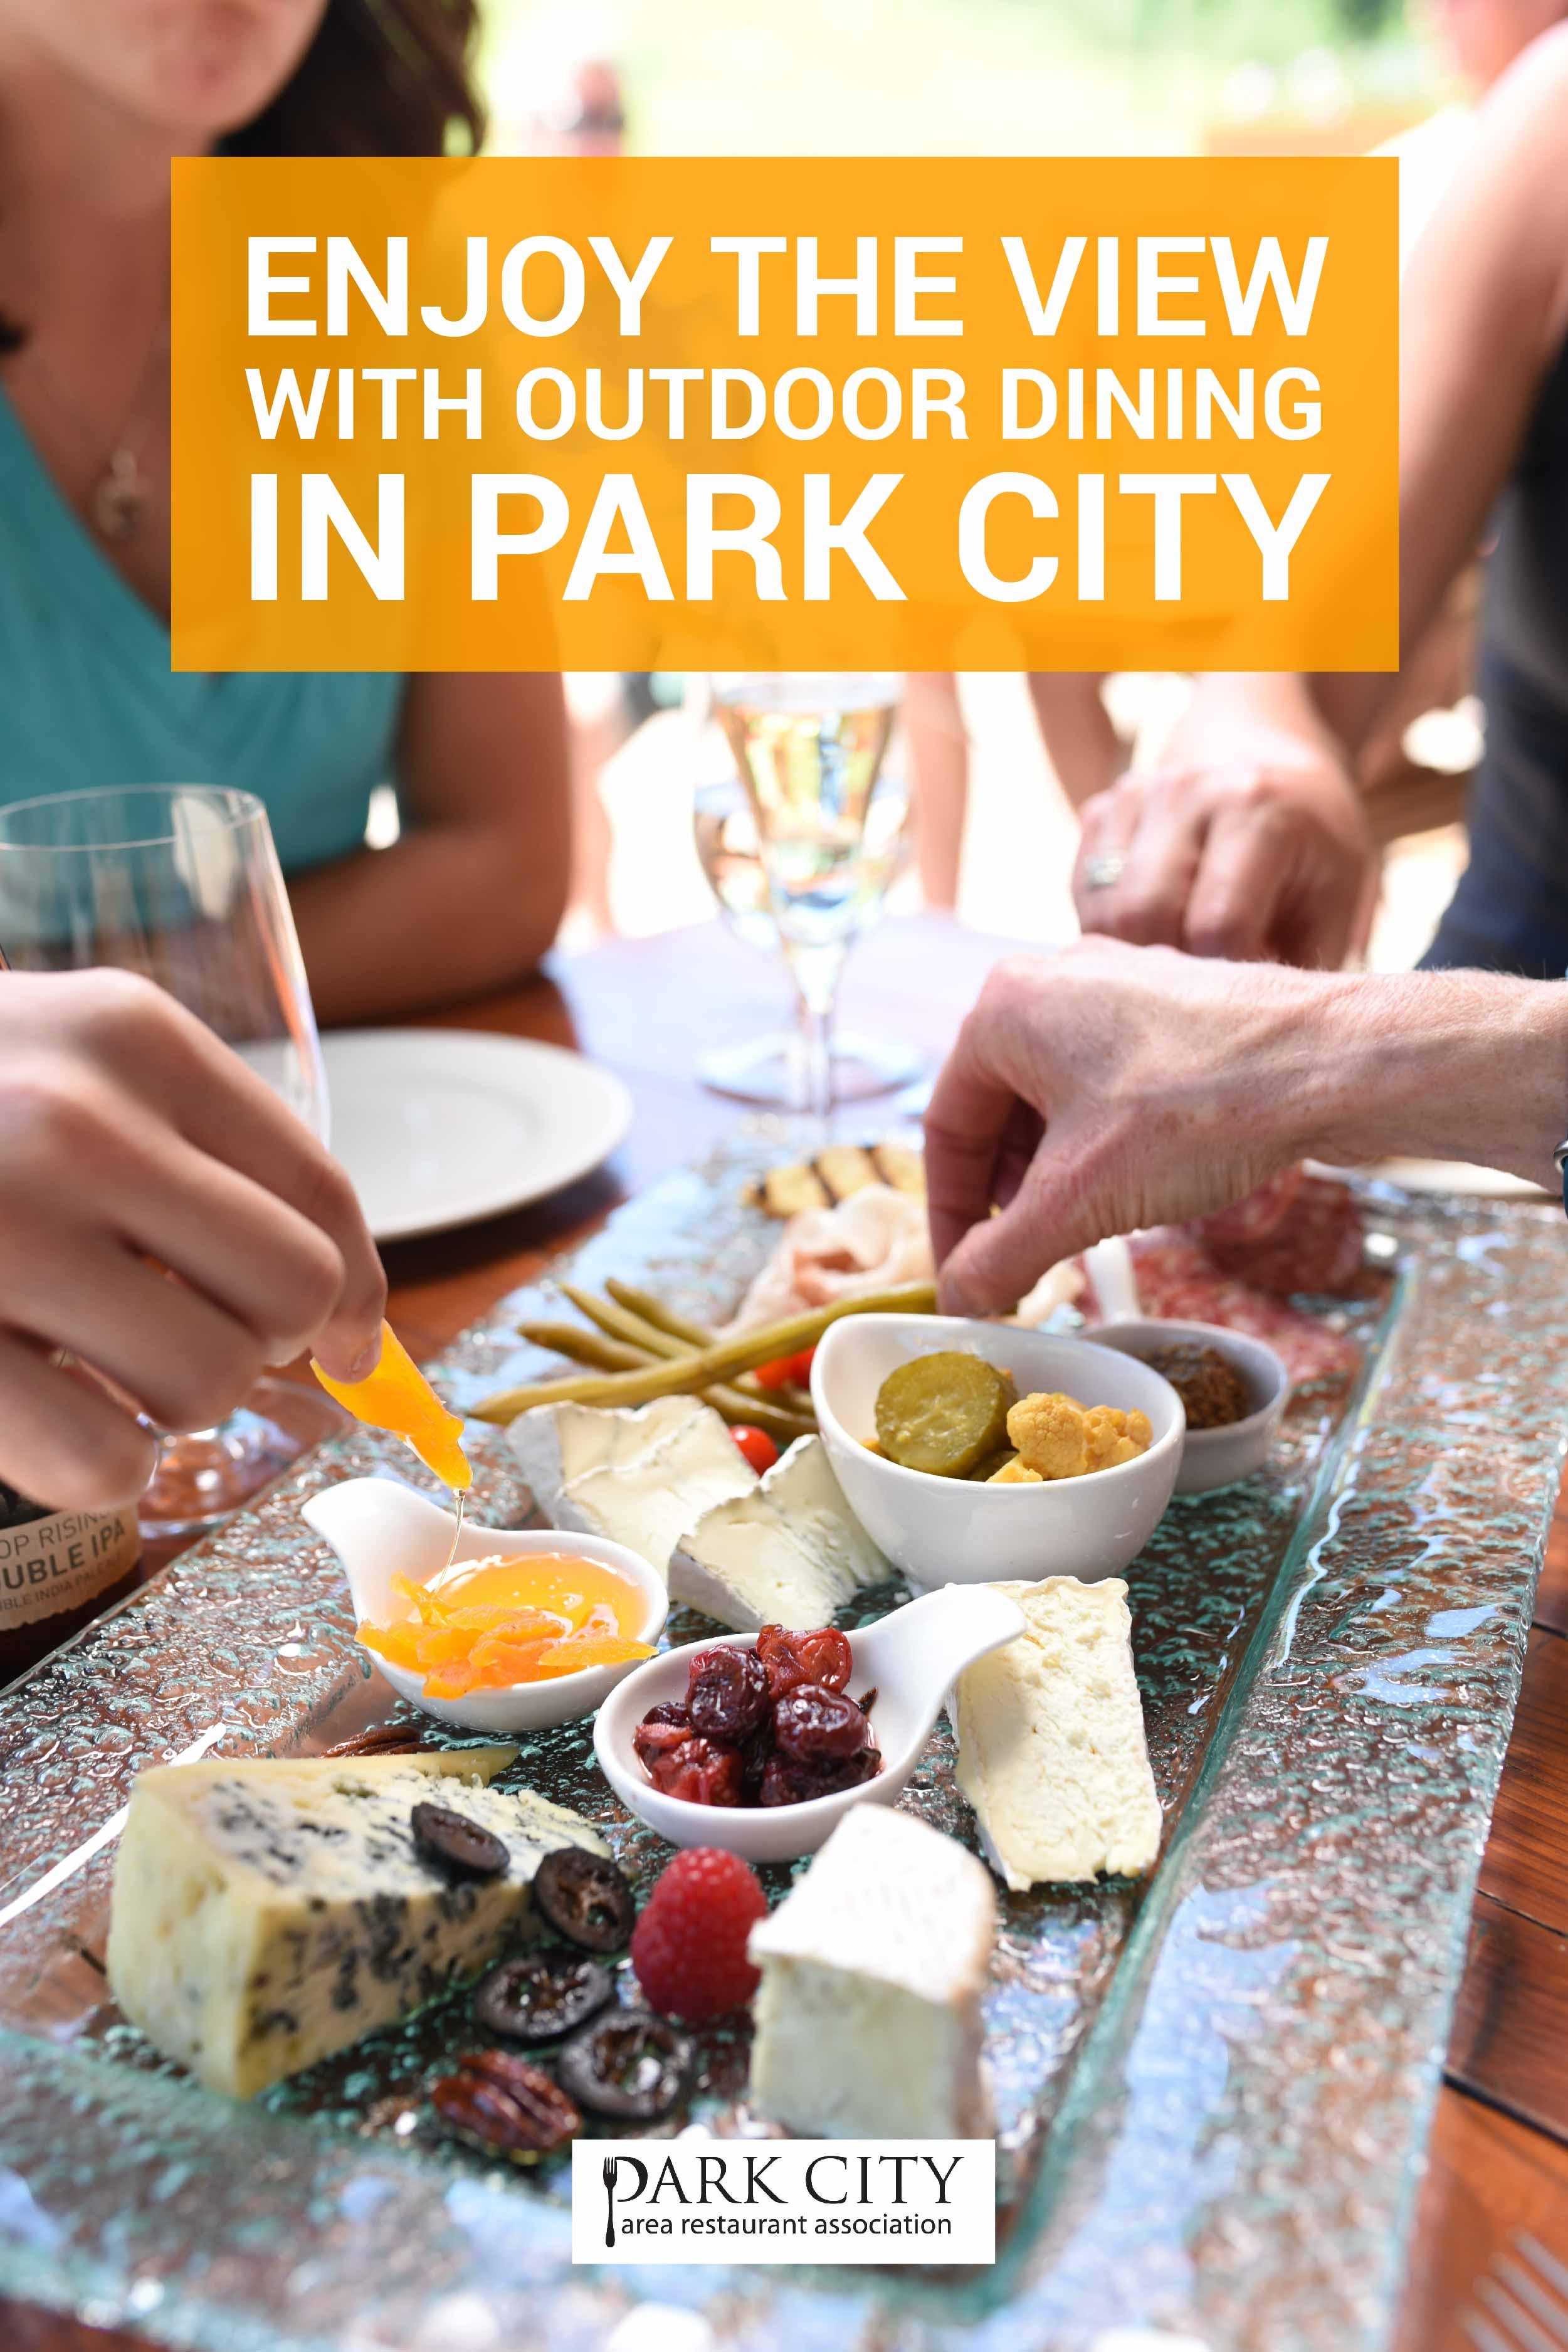 enjoy-outdoor-dining-in-park-city